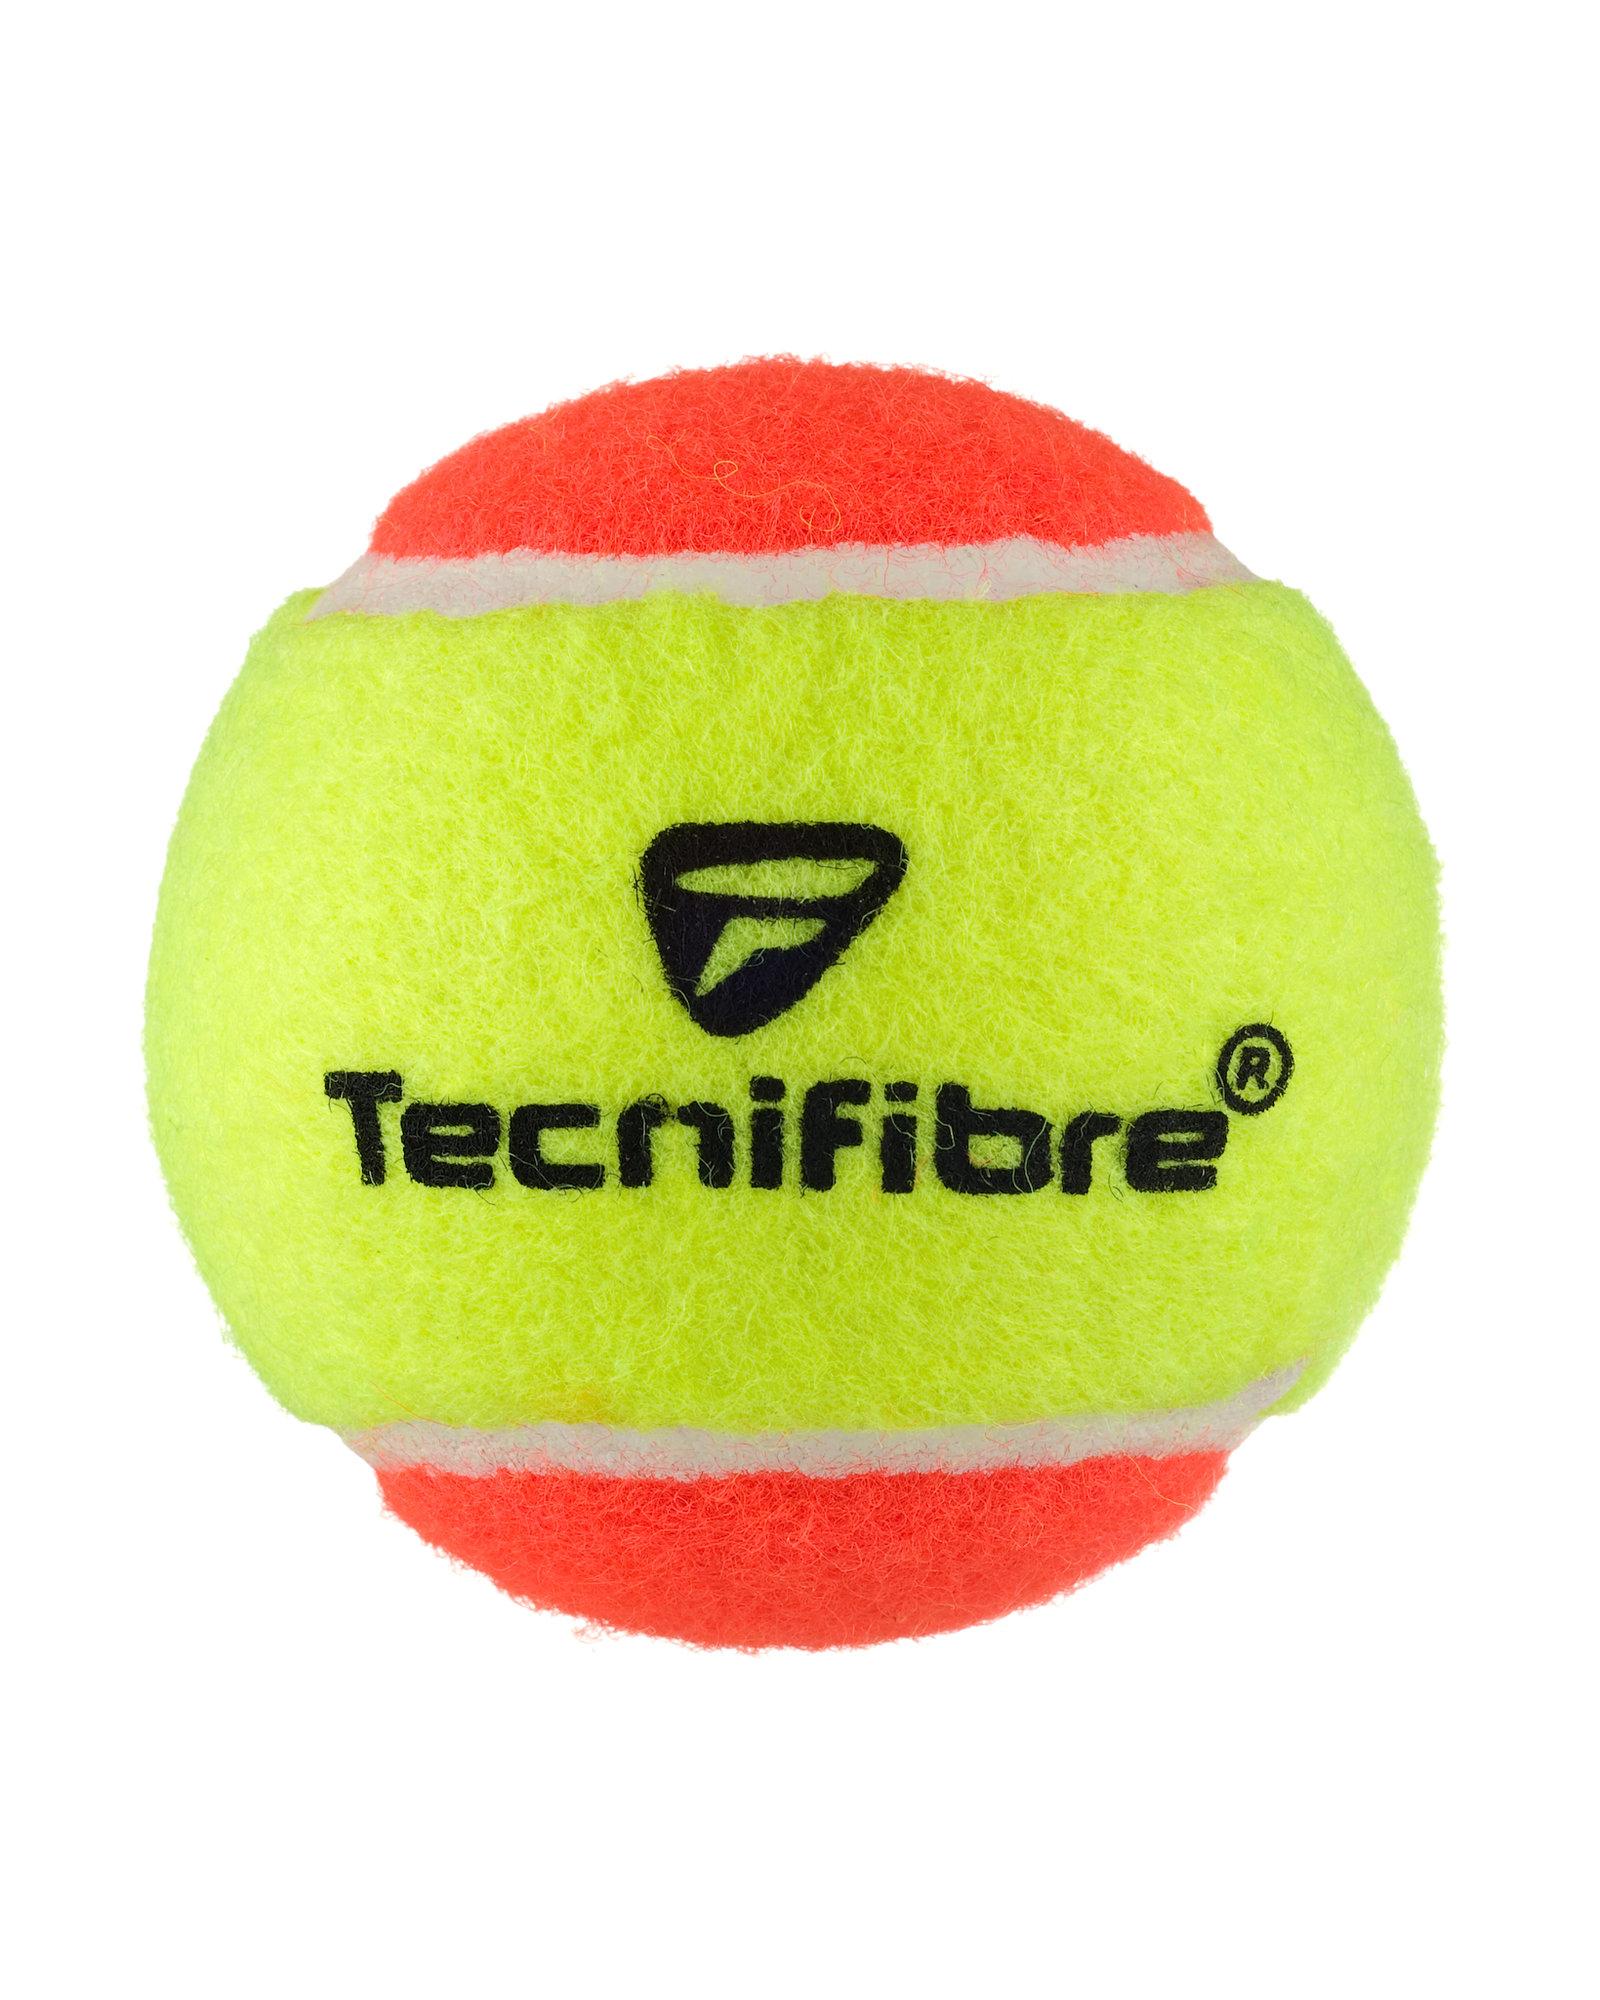 49d12766e66 Tecnifibre TF Mini (Orange) Tennis 3 Ball Tube – SGS